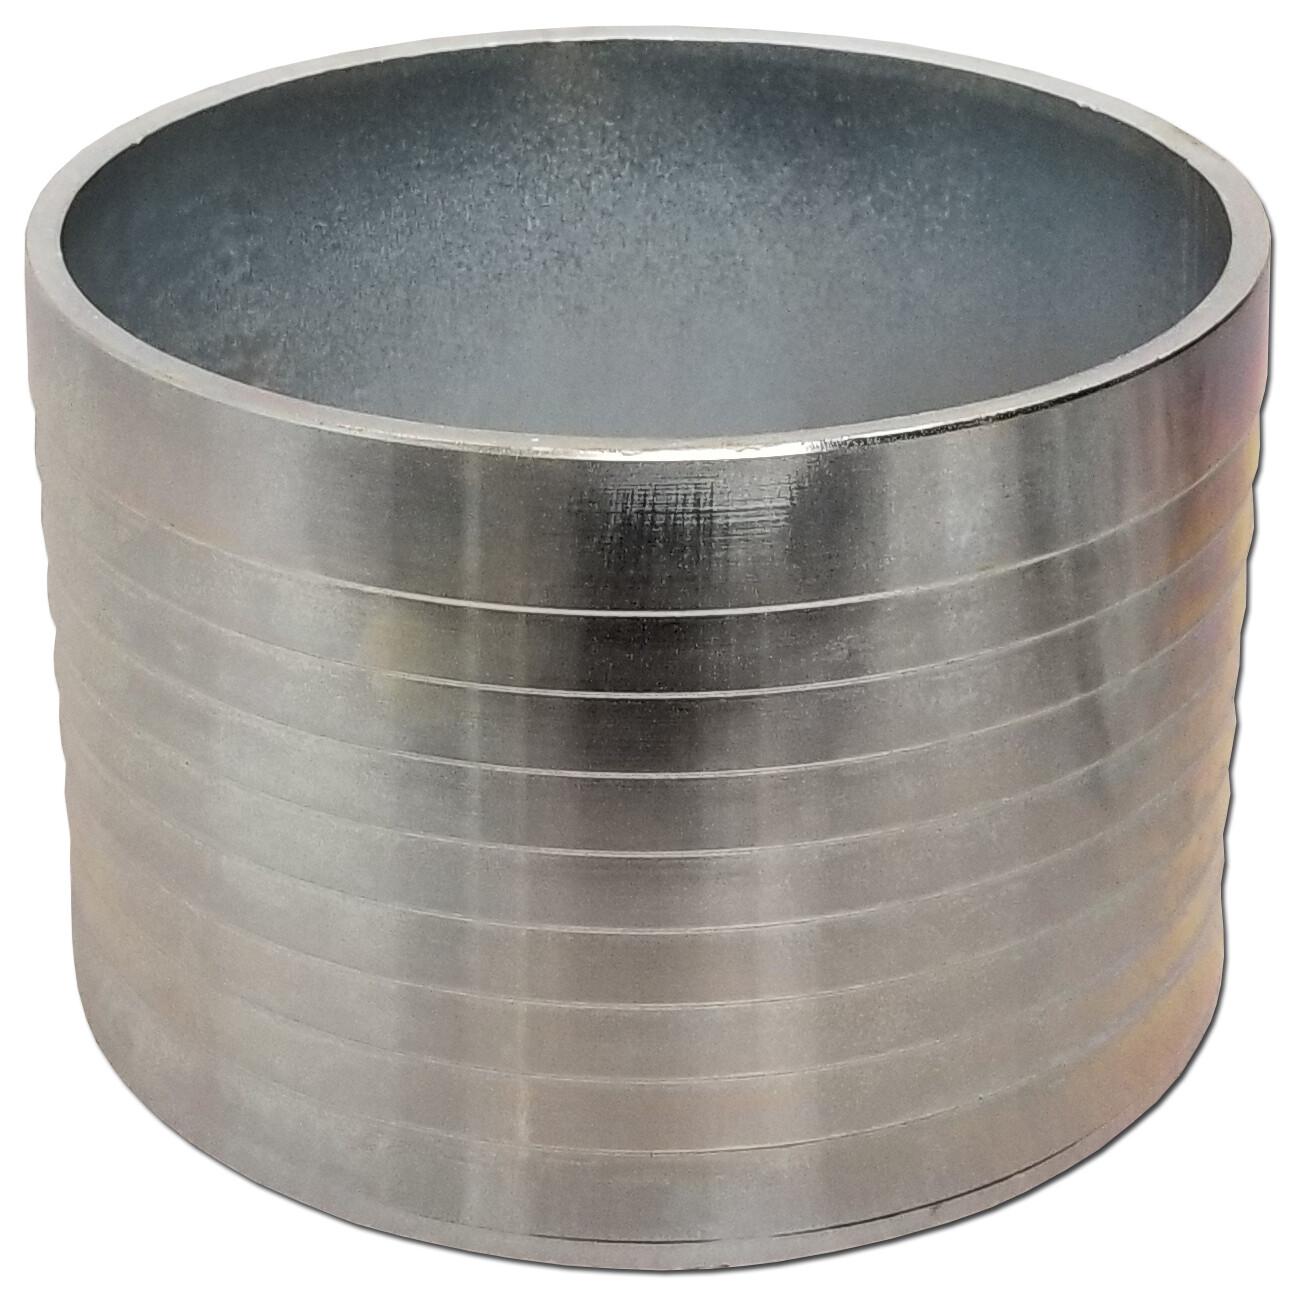 Steel Weld-On Hose Shank / Barb Fittings